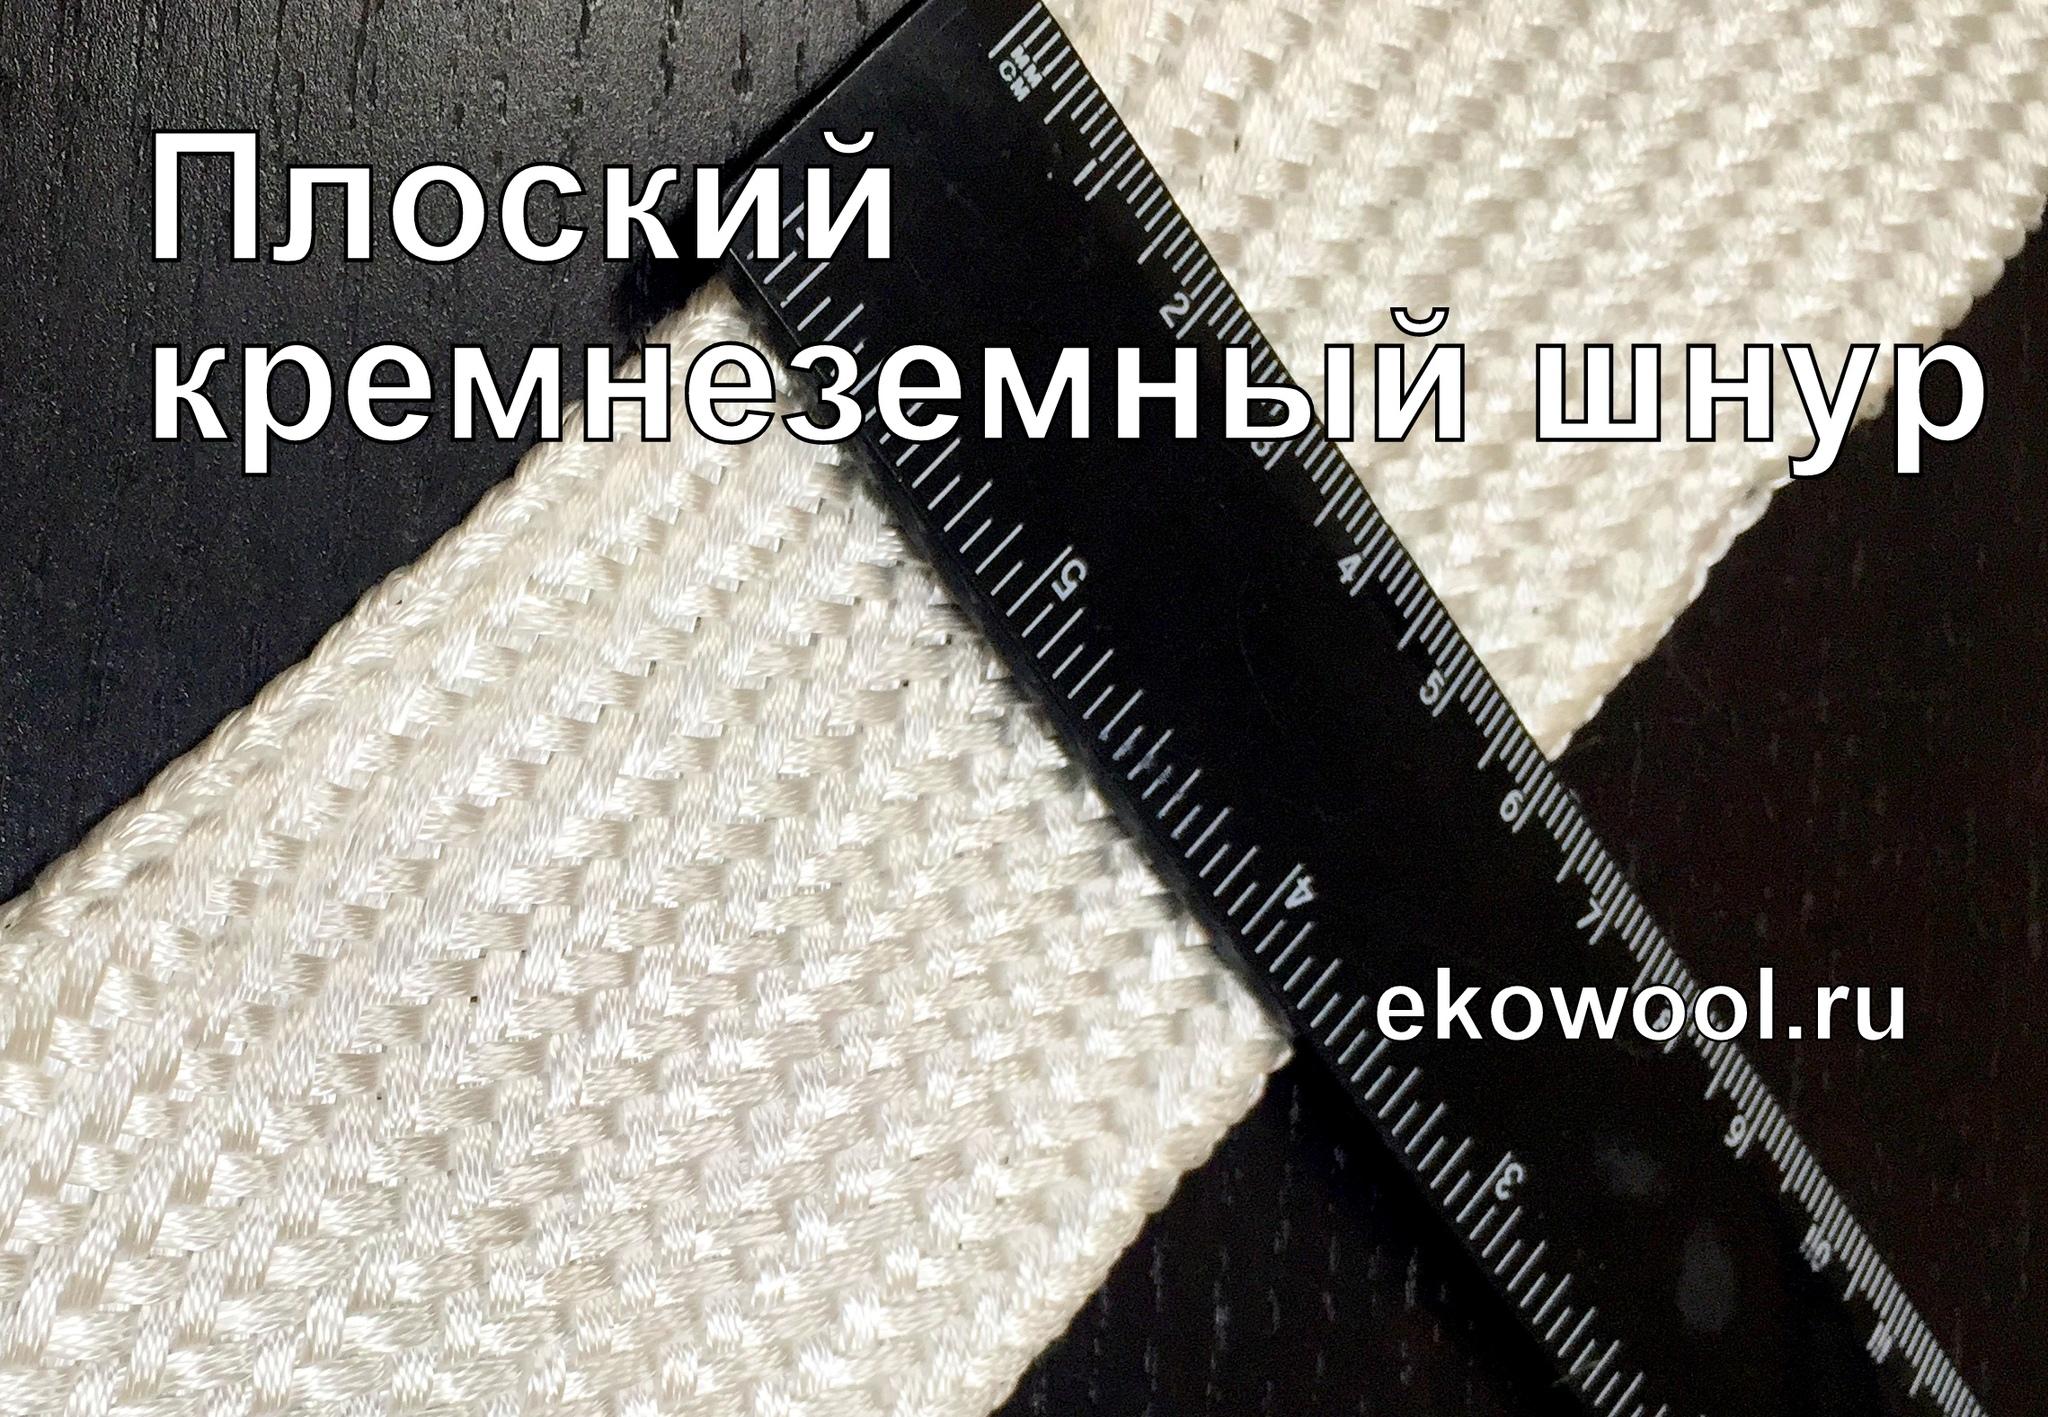 Кремнеземный шнур ШК-60